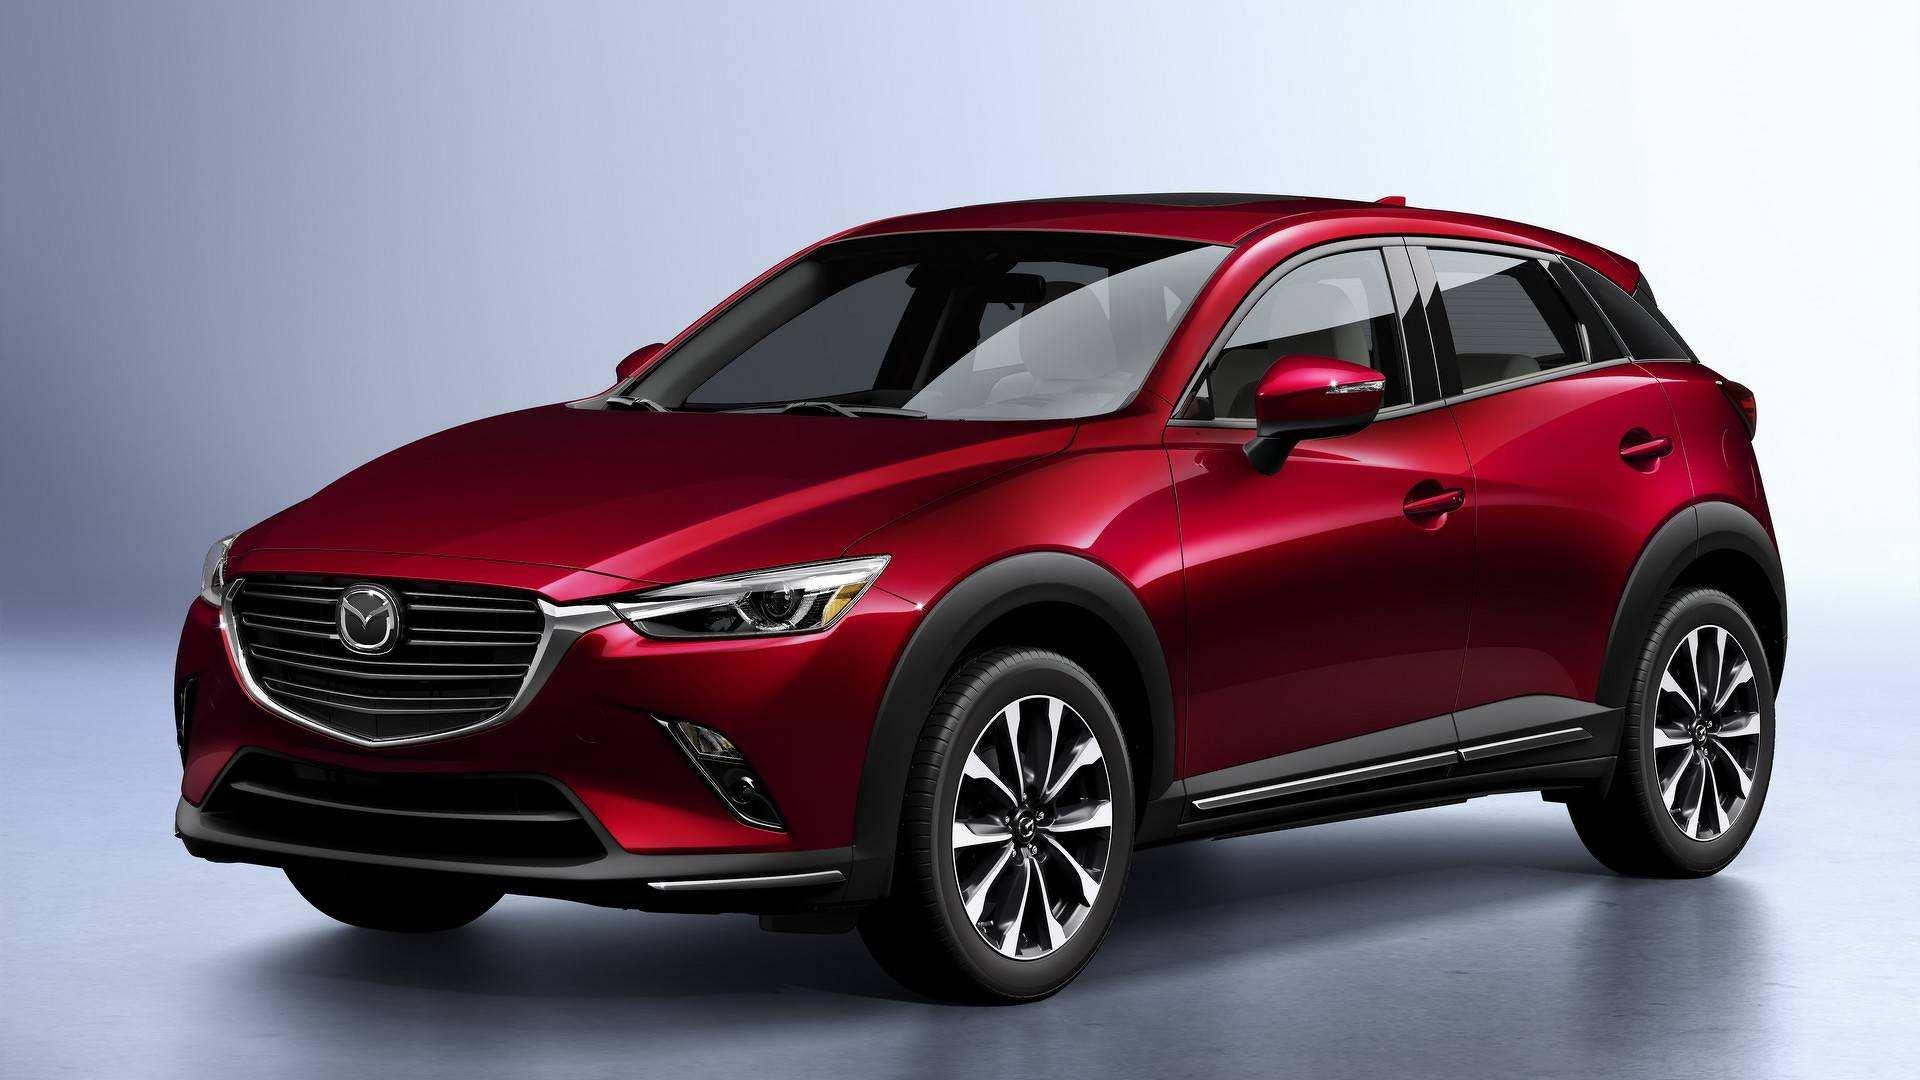 91 All New Mazda X3 2020 Rumors with Mazda X3 2020